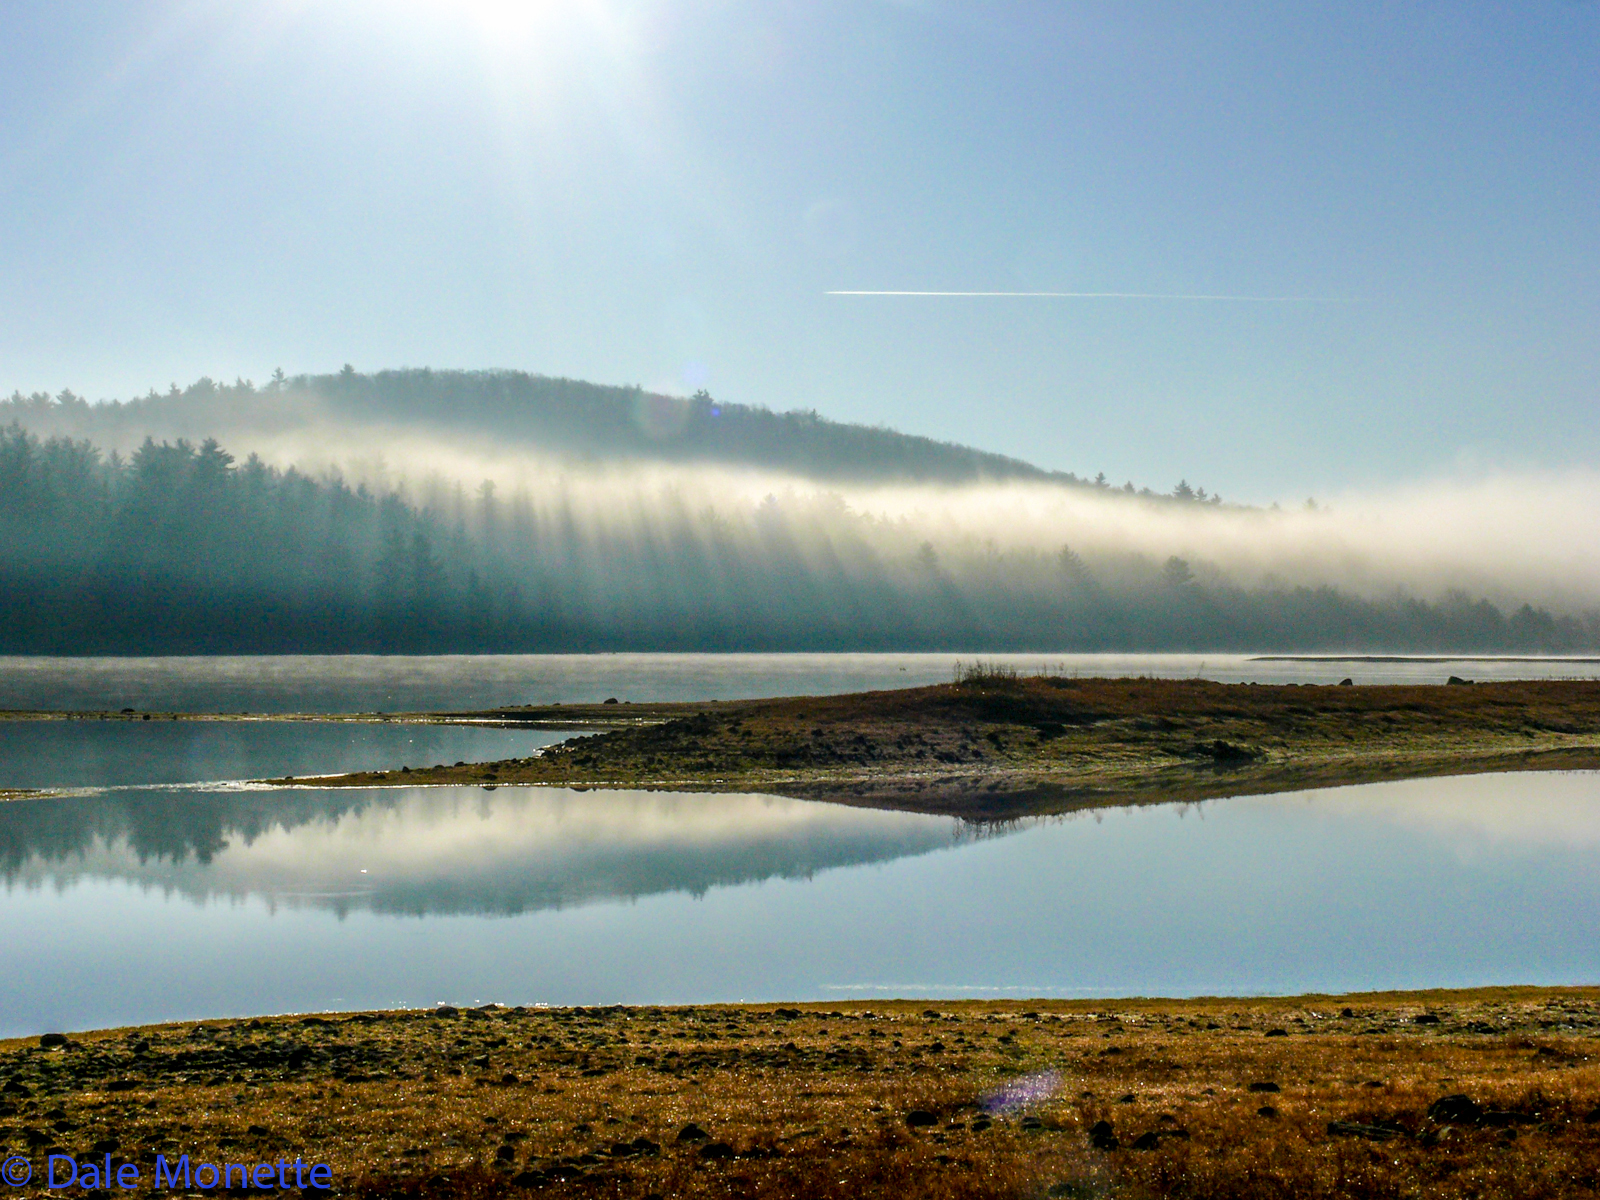 Late fall, North Dana fog dissipates under the sun.